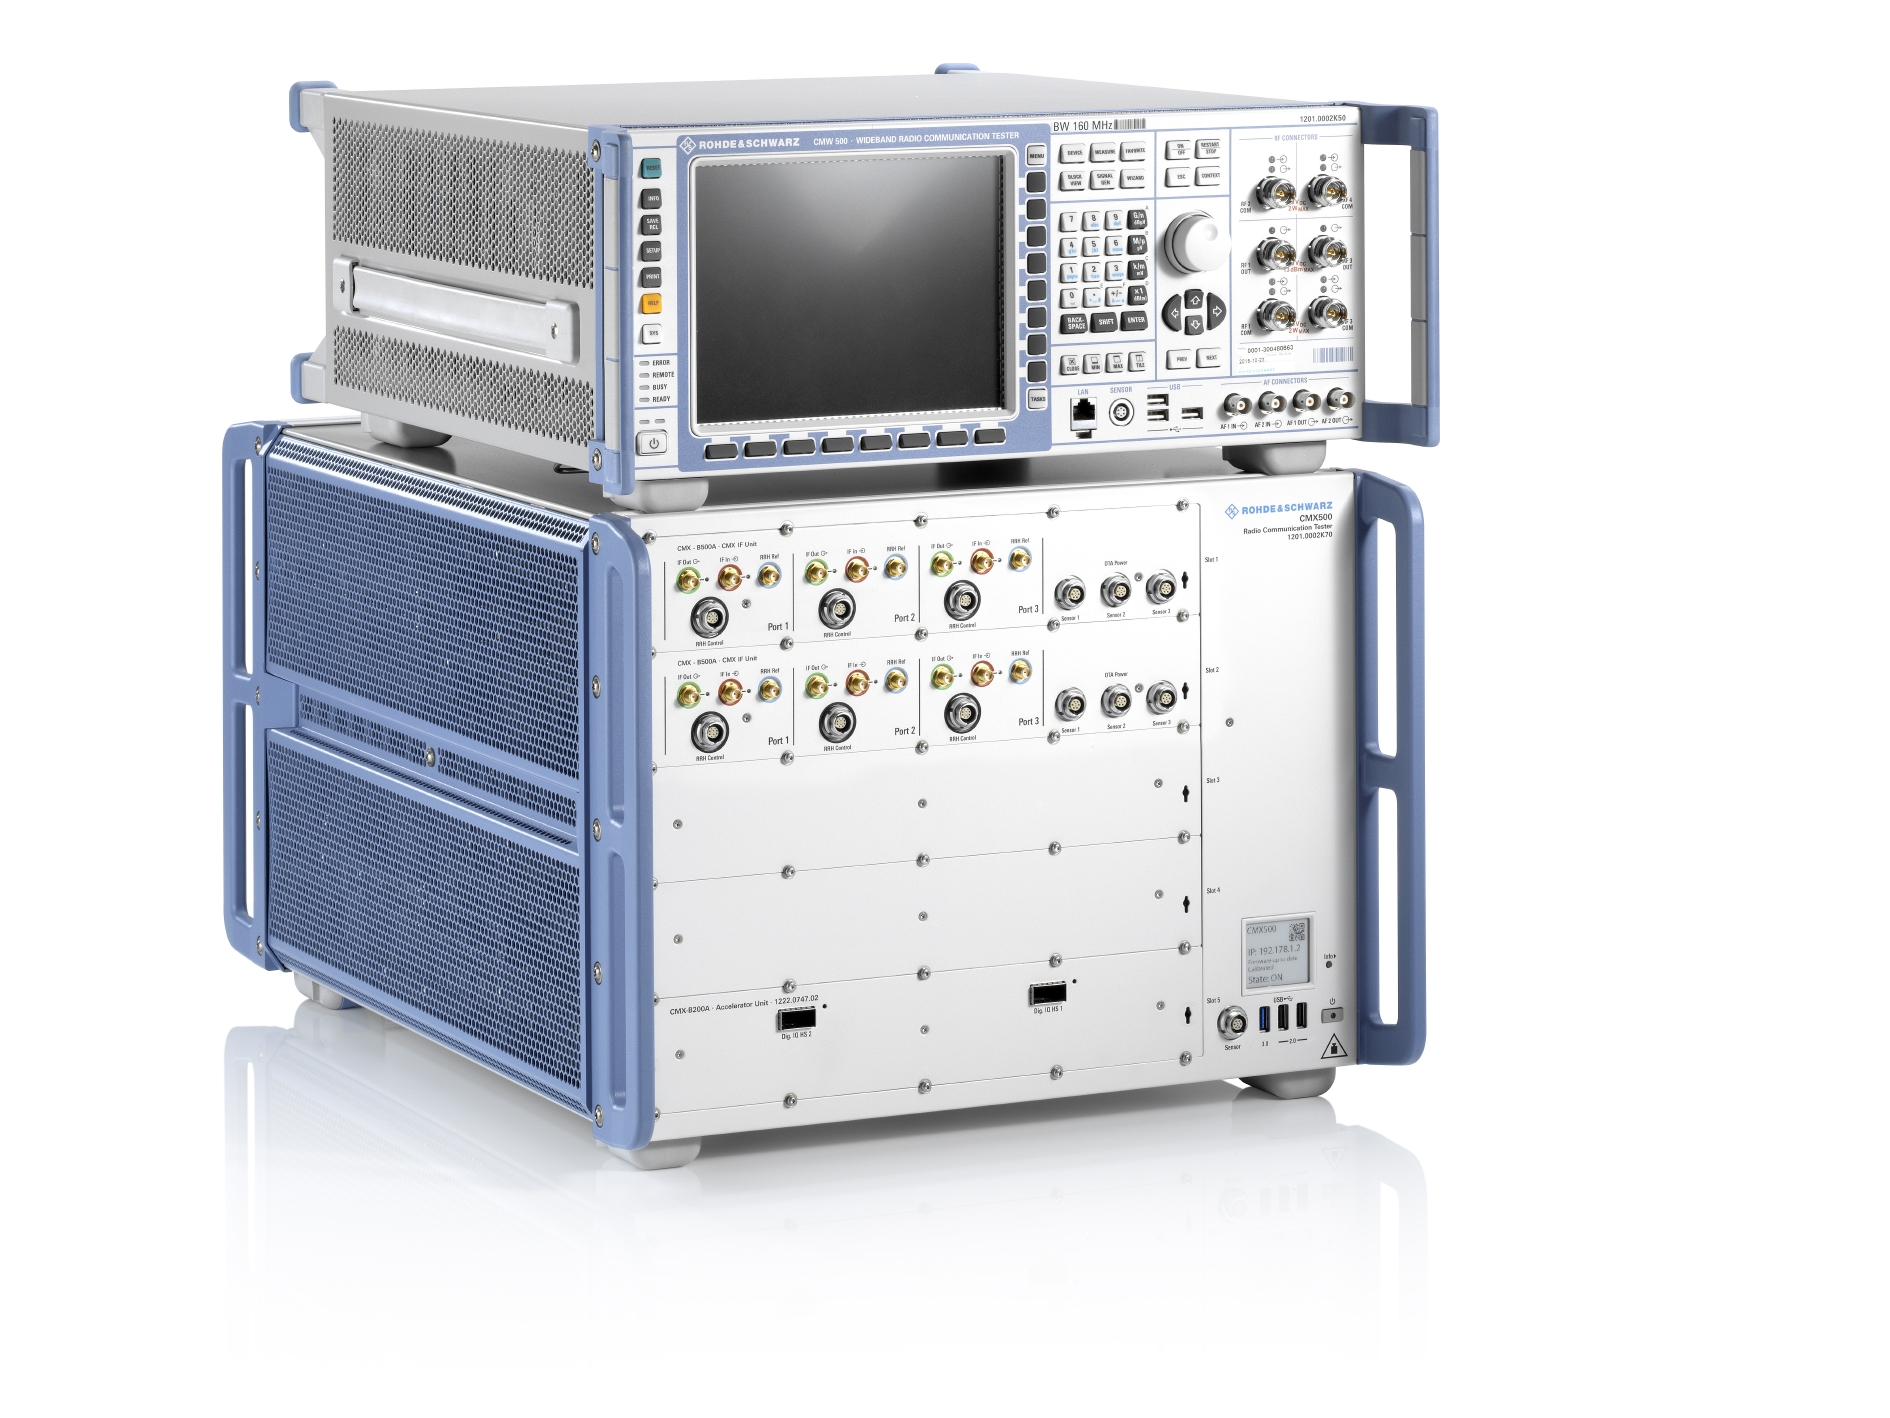 Rohde & Schwarz Demonstrates Test Capability of 3GPP 5G New Radio Using  Qualcomm(R) Snapdragon X50 5G Modem